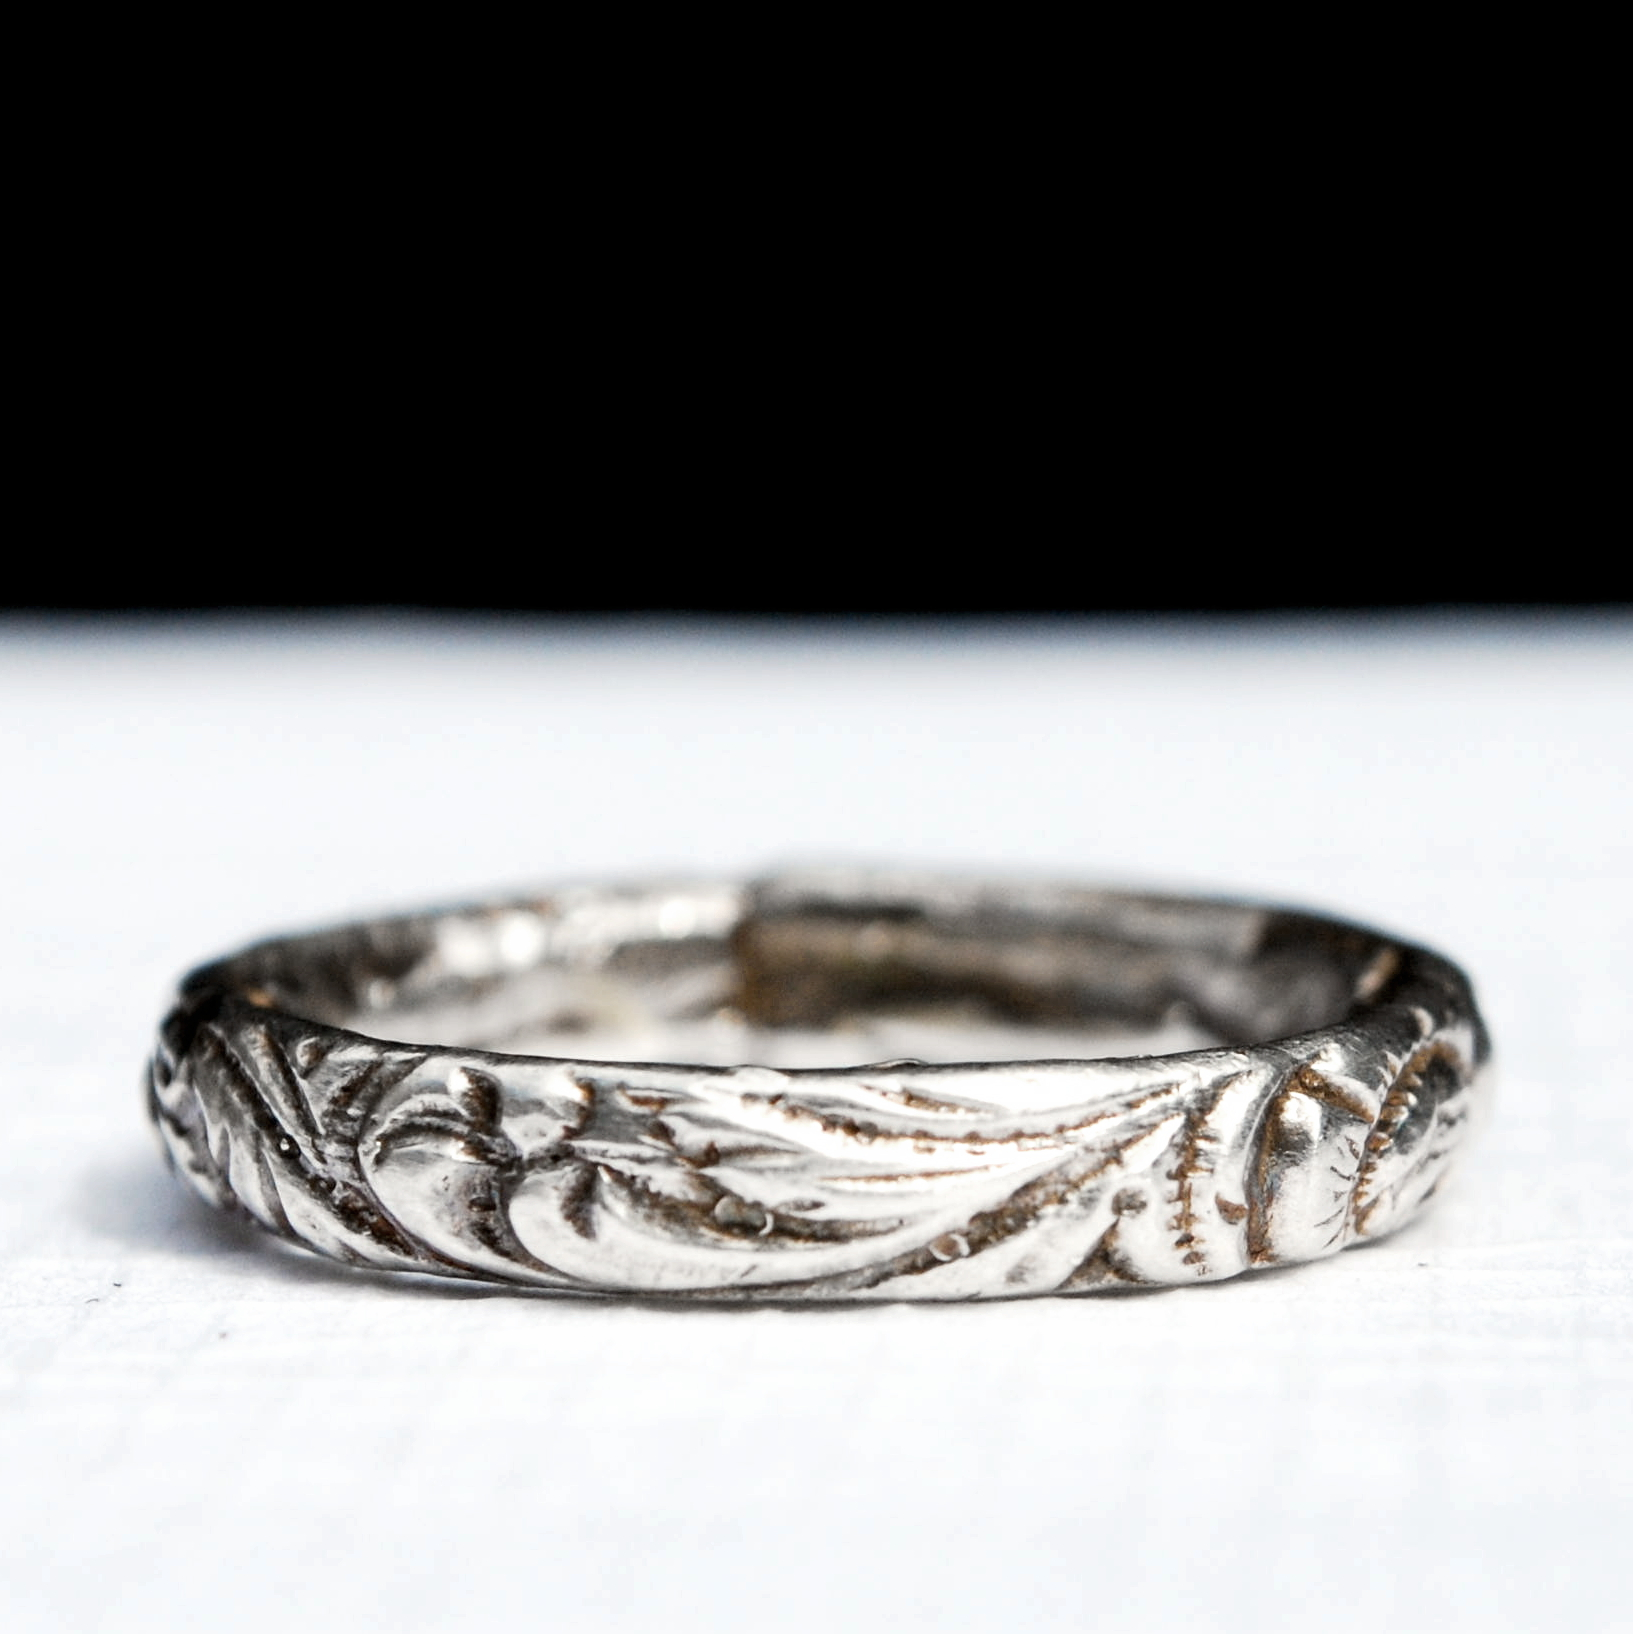 artefact - 180419 - garden ring stack 04.jpg